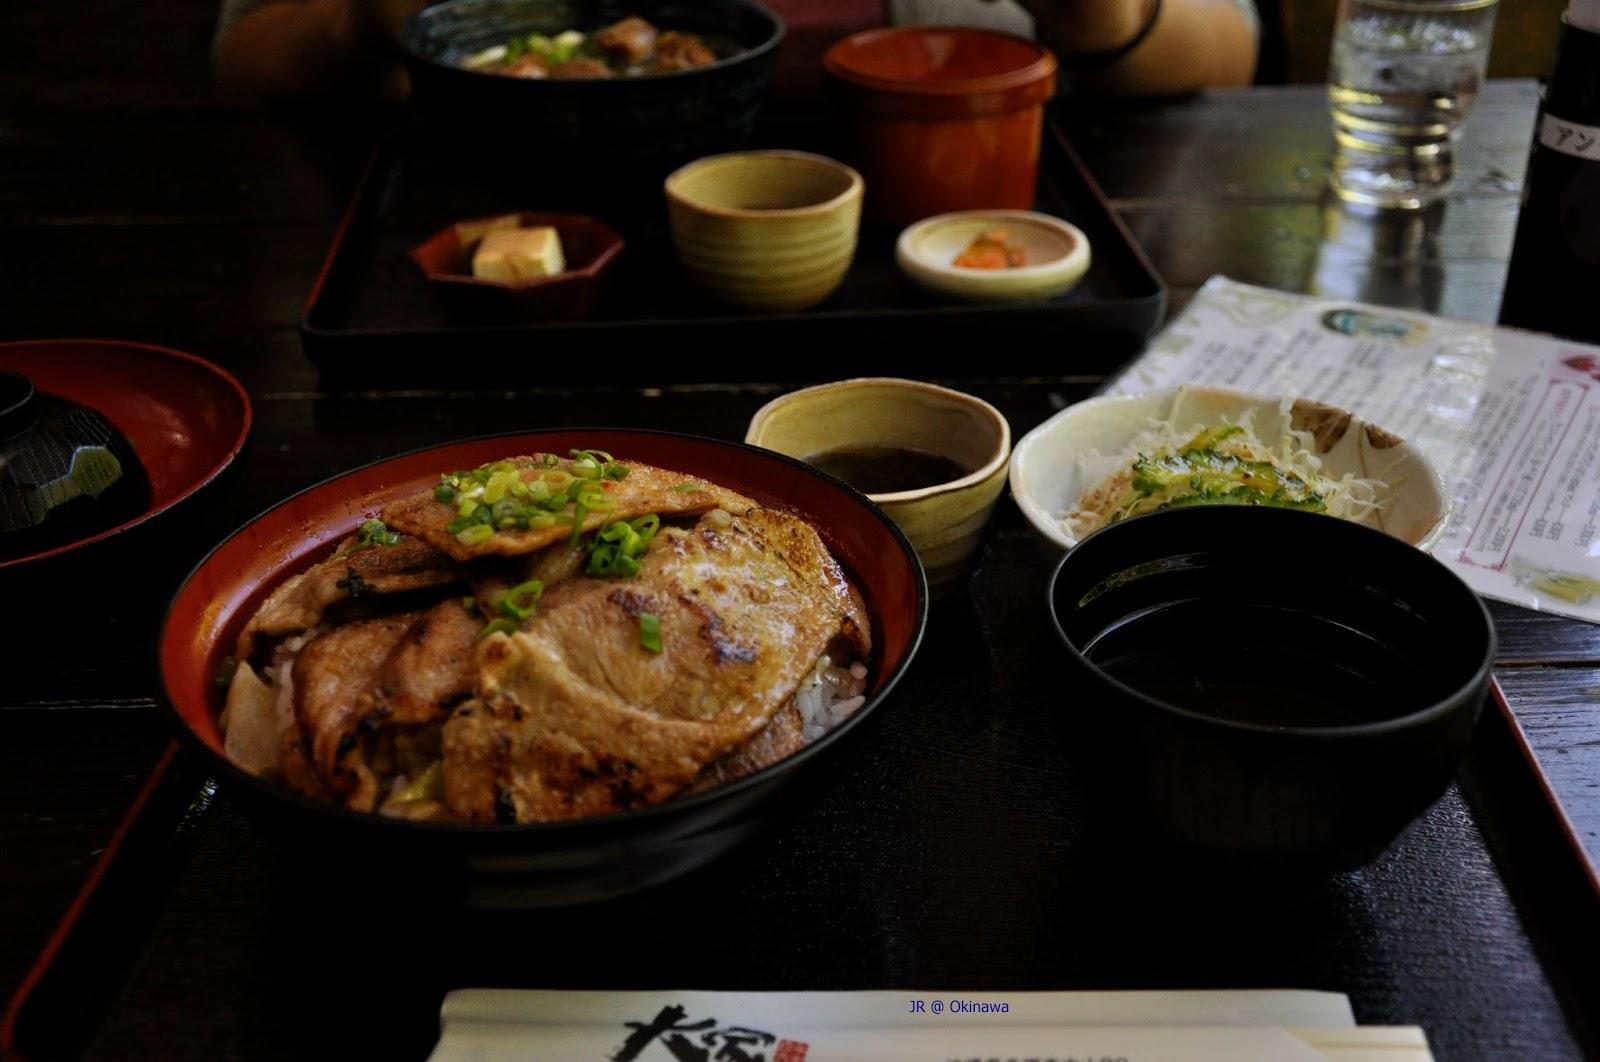 Its my place okinawa japan zanpa cape manzomo and for Ajk chinese cuisine